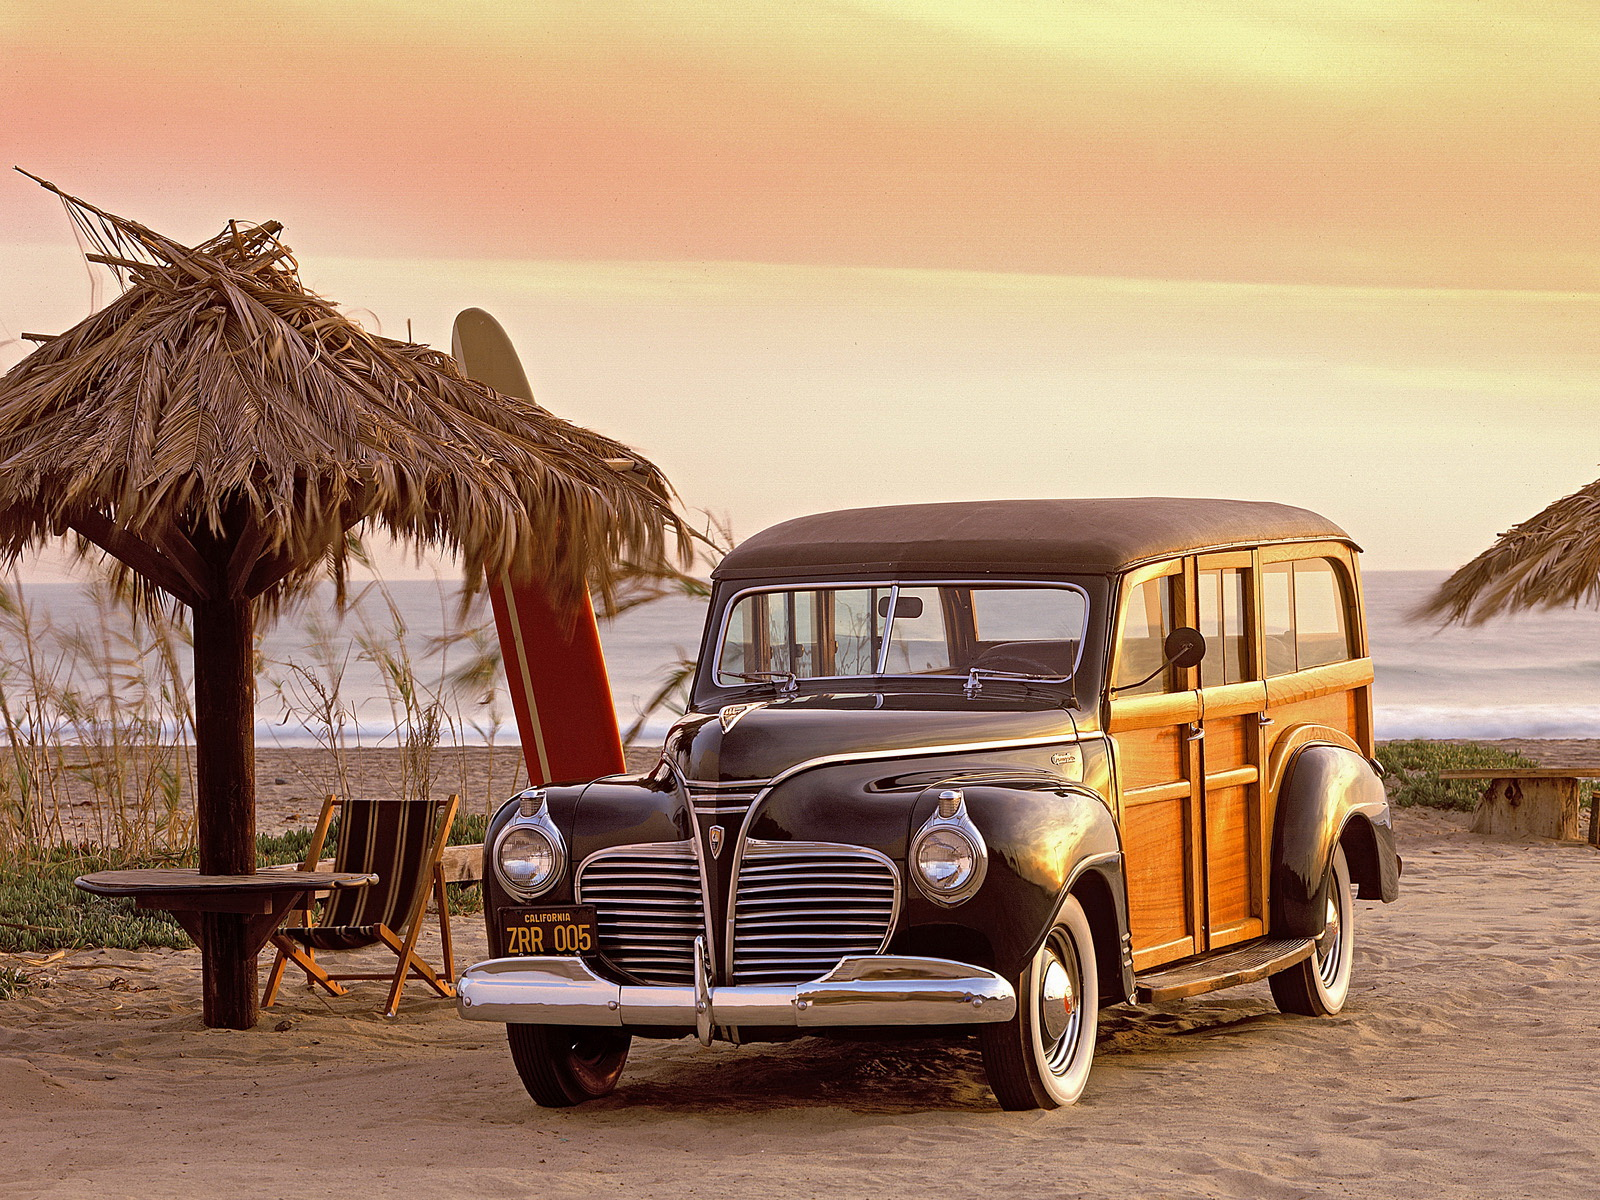 Plymouth Retro Classic Cars Beach Wallpaper